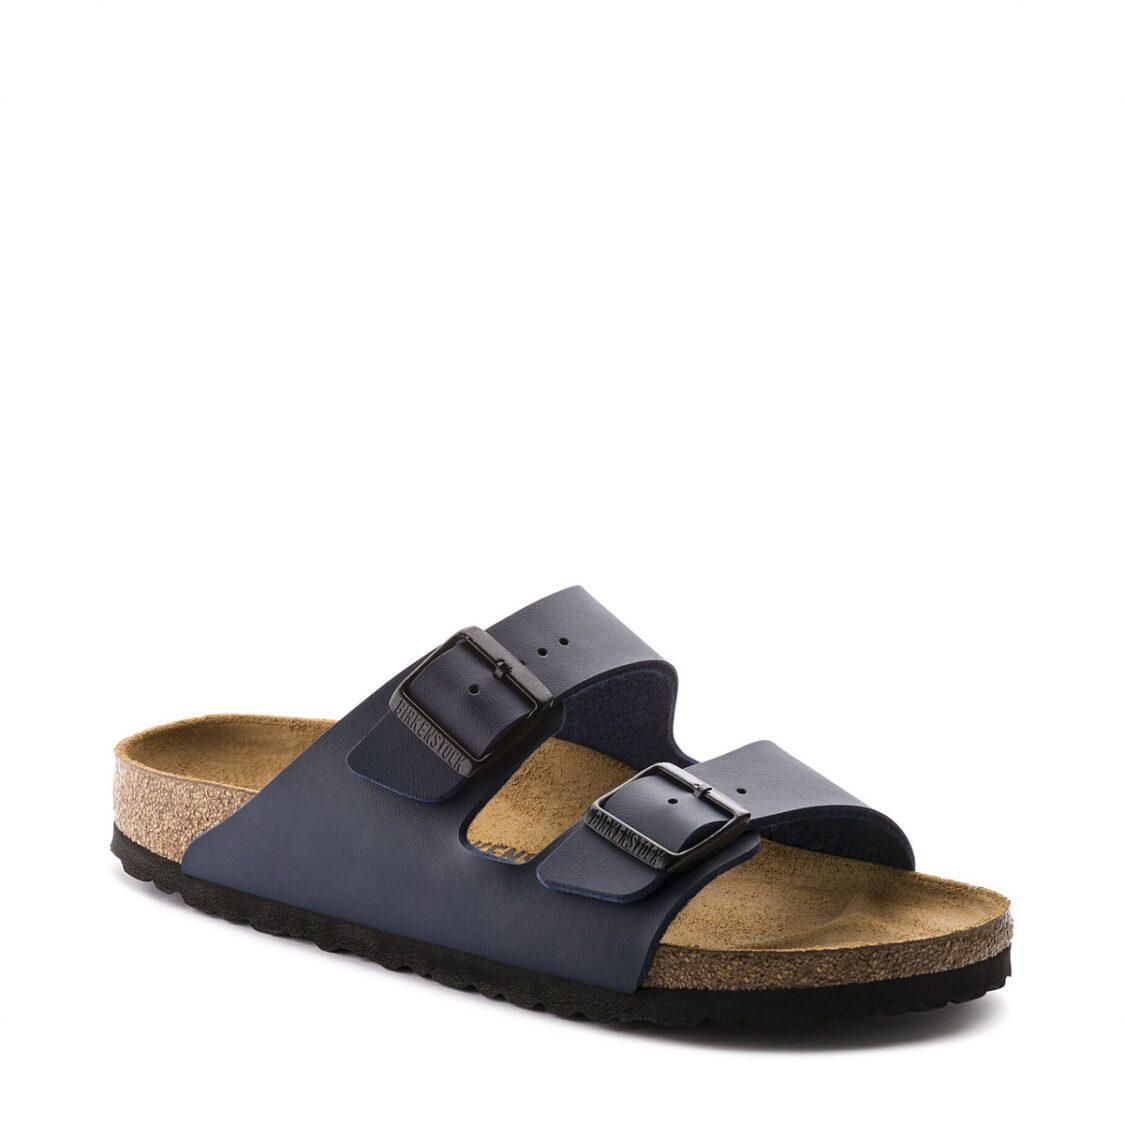 Birkenstock Arizona Birko-Flor Unisex Regular Width Sandals Blue